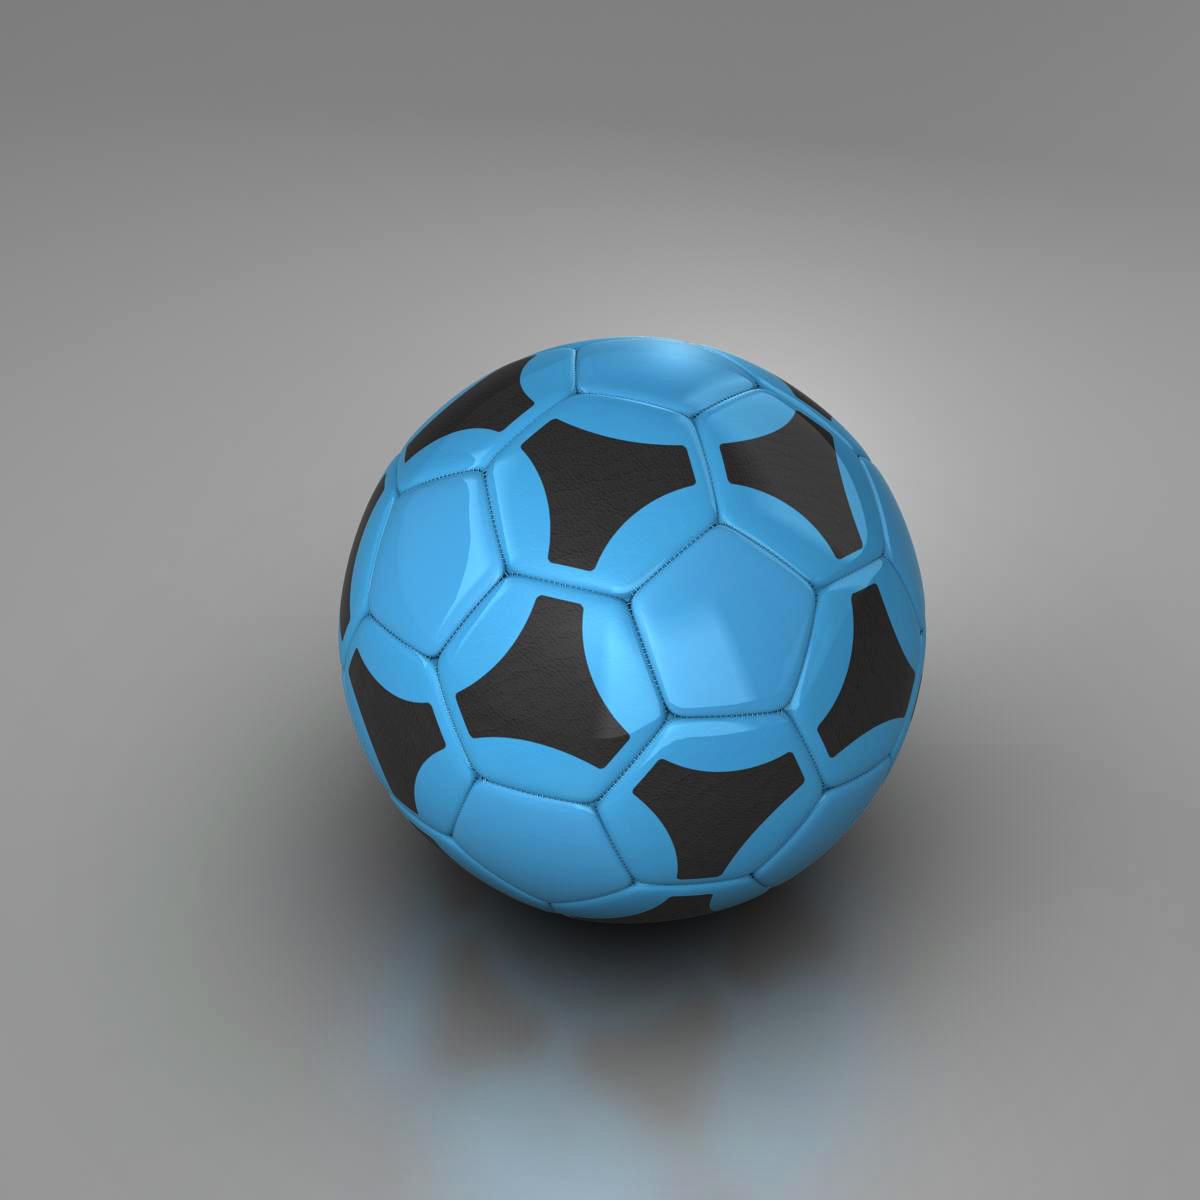 soccerball цэнхэр хар 3d загвар 3ds max fbx c4d ma mb obj 204377